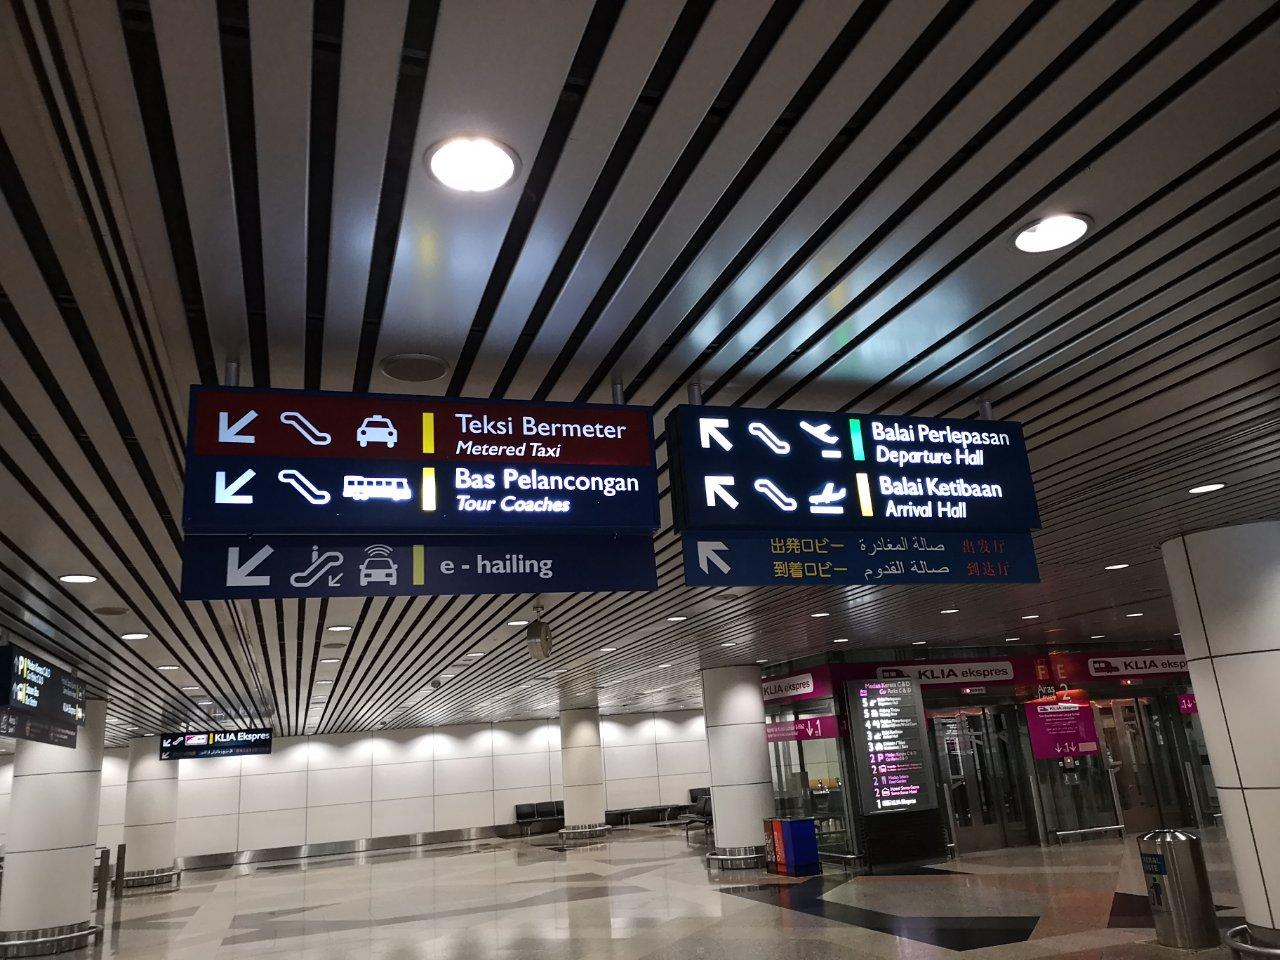 KLセントラル駅からバスでクアラルンプール国際空港にバスで移動する方法28